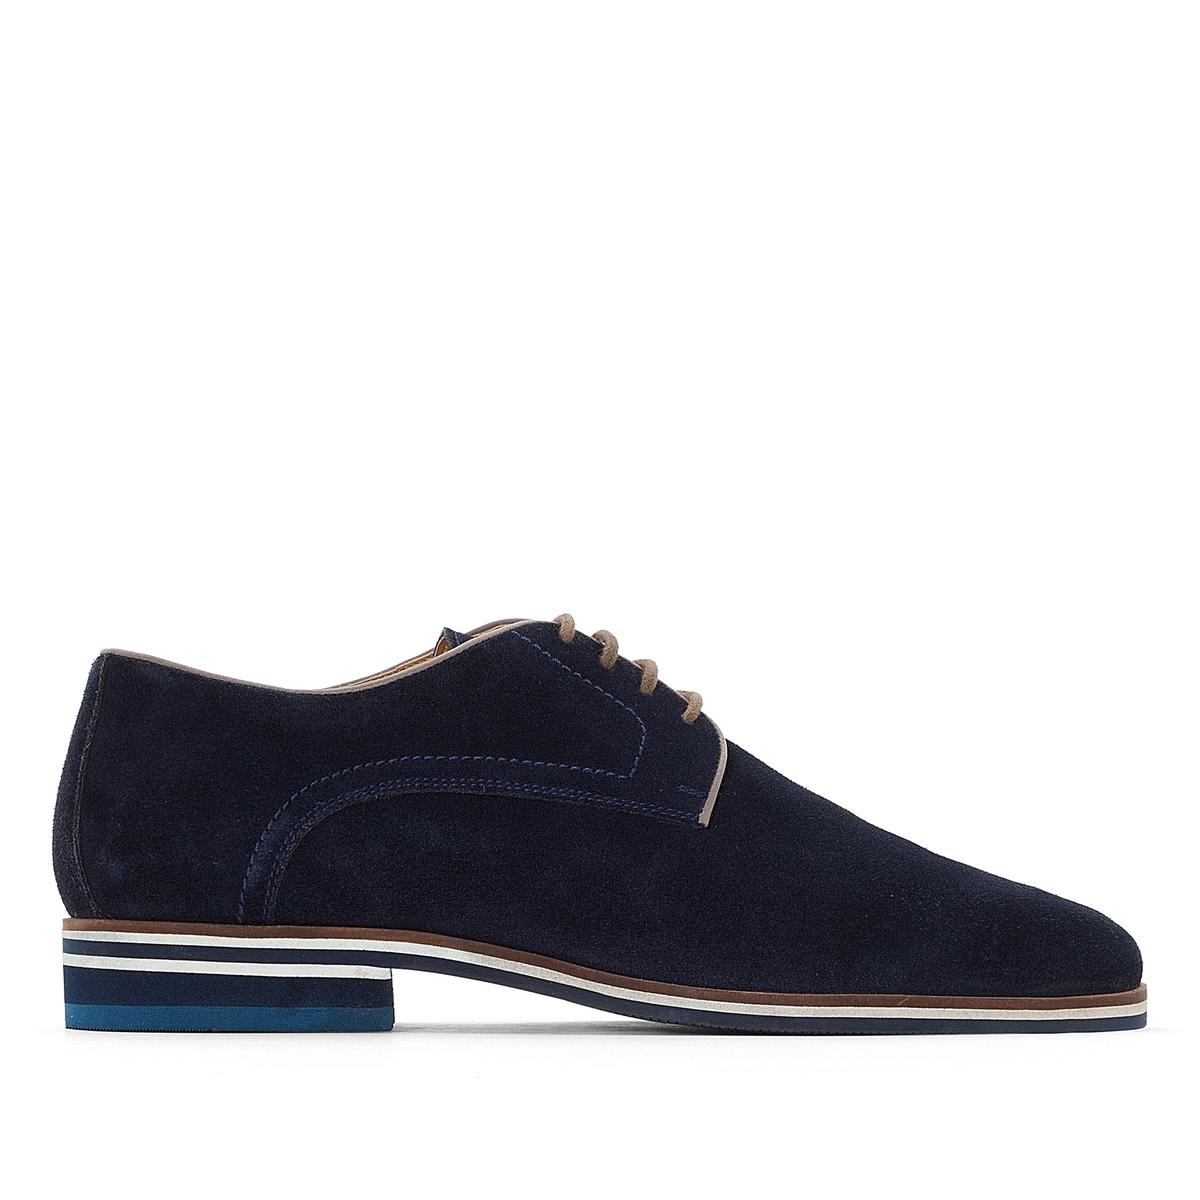 Ботинки-дерби из спилка на шнуровке ботинки из спилка